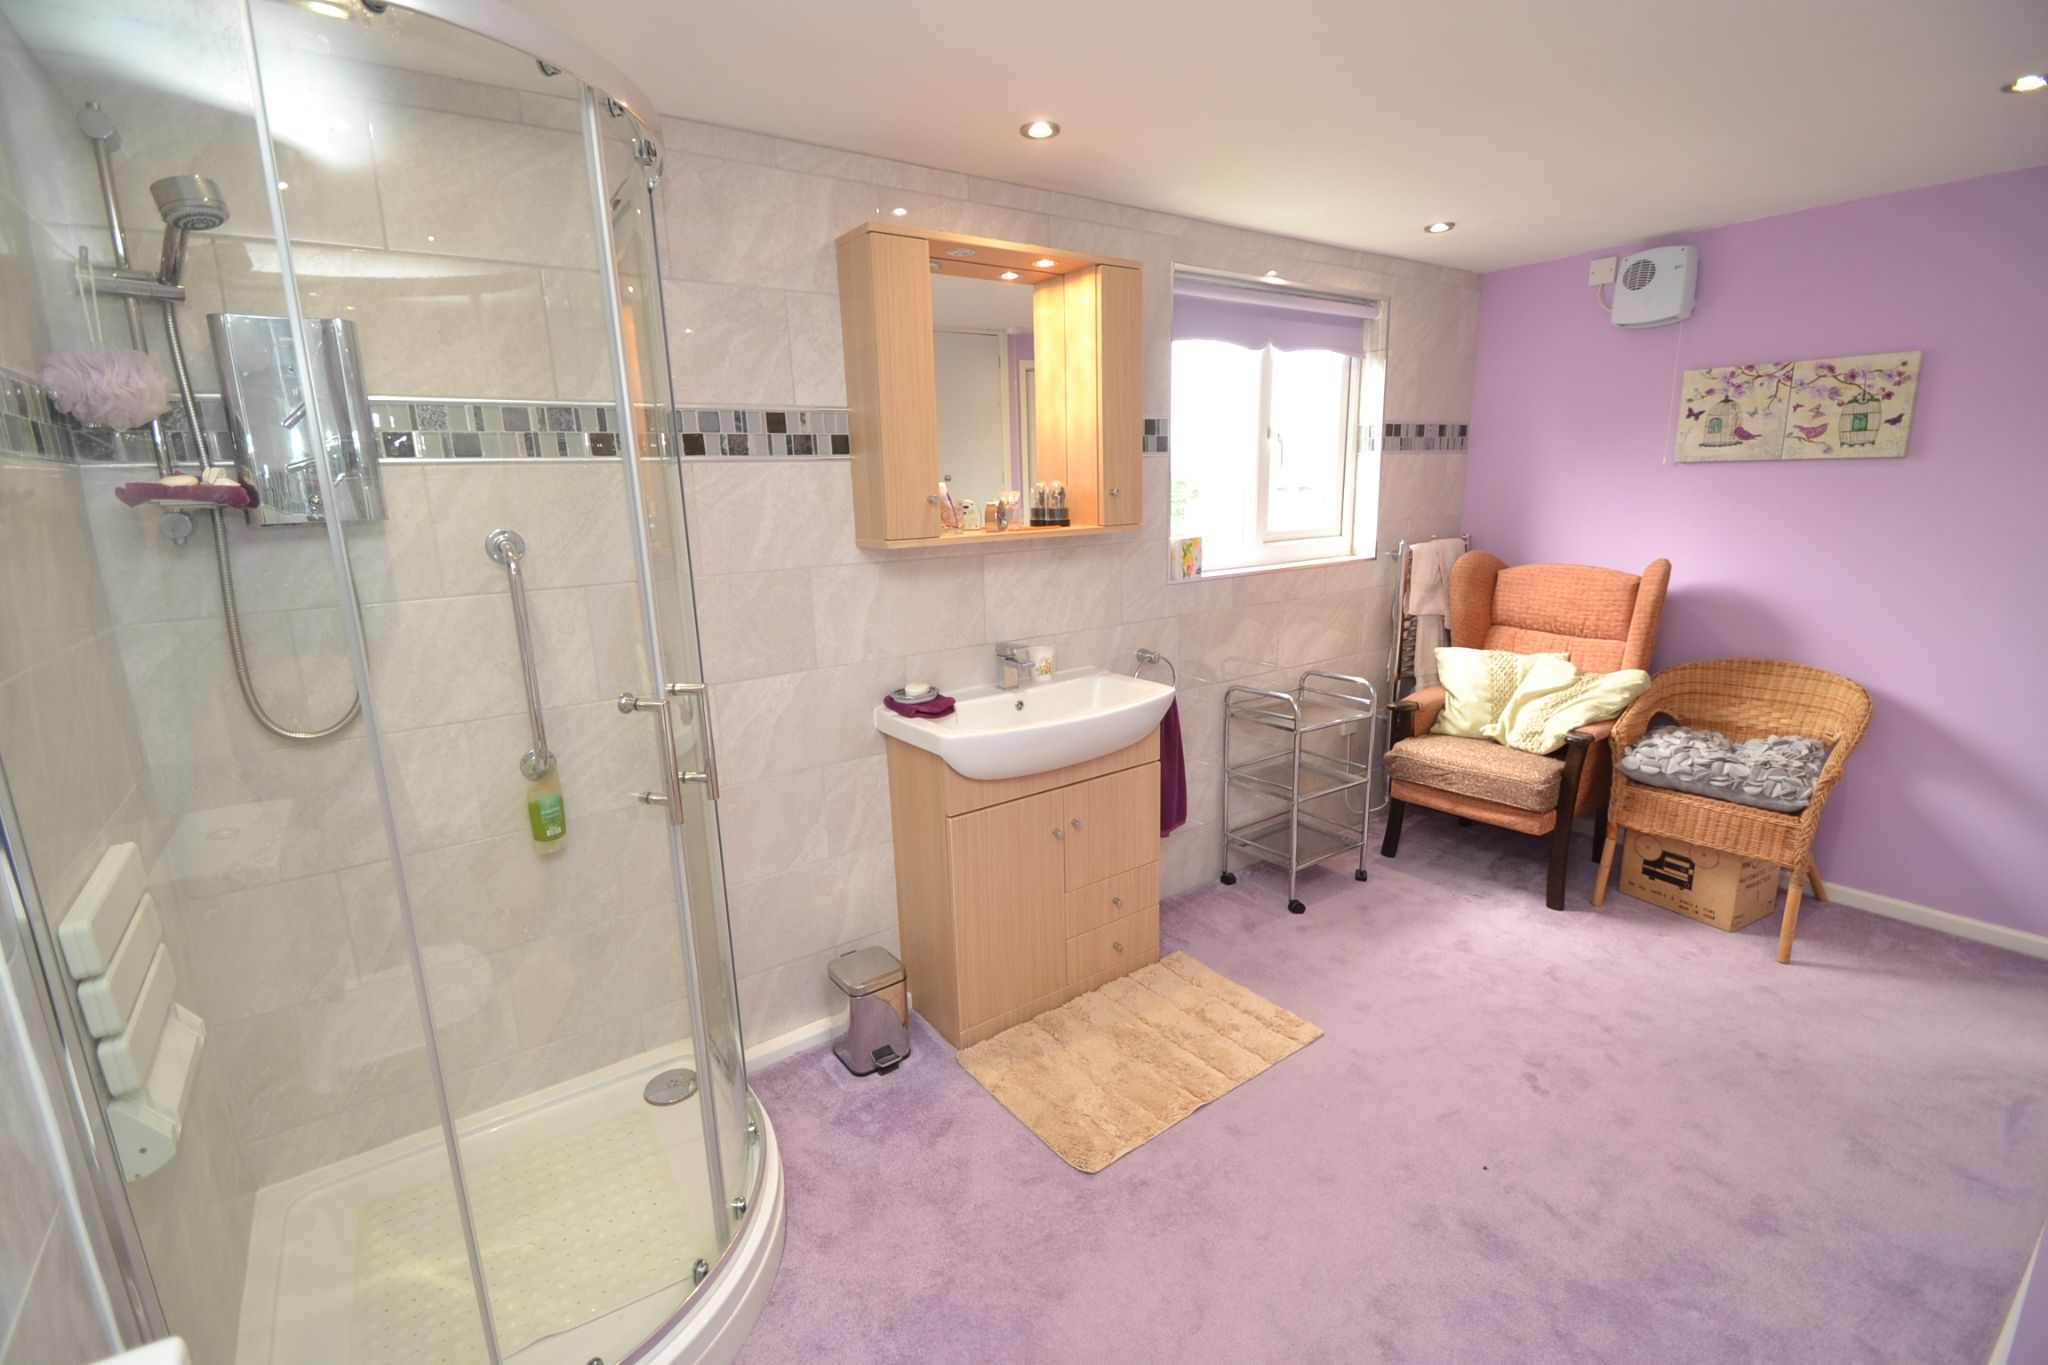 3 Bedroom Semi-detached Dormer House For Sale - Photograph 11